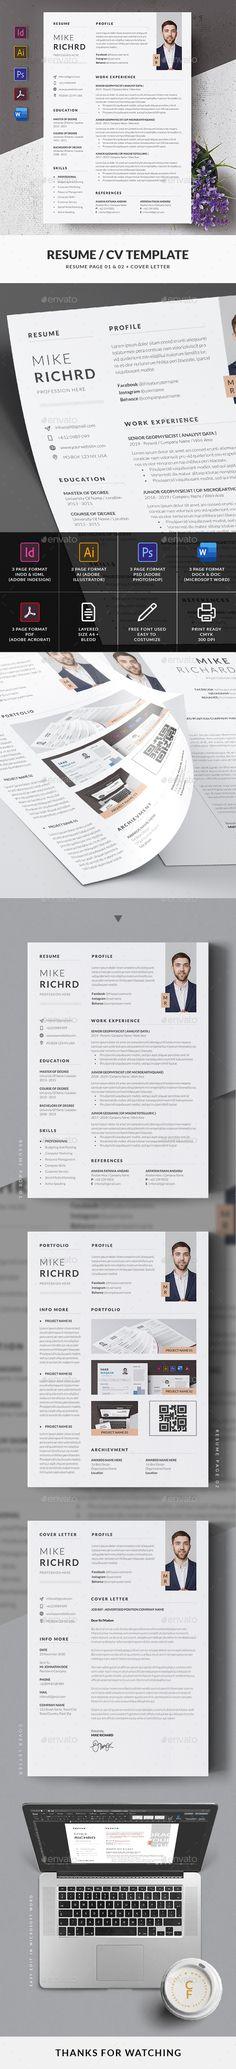 Resume / CV Template Cv Template, Resume Templates, Cv Design, Change Image, Resume Cv, Microsoft Word, Very Well, Photoshop, Words